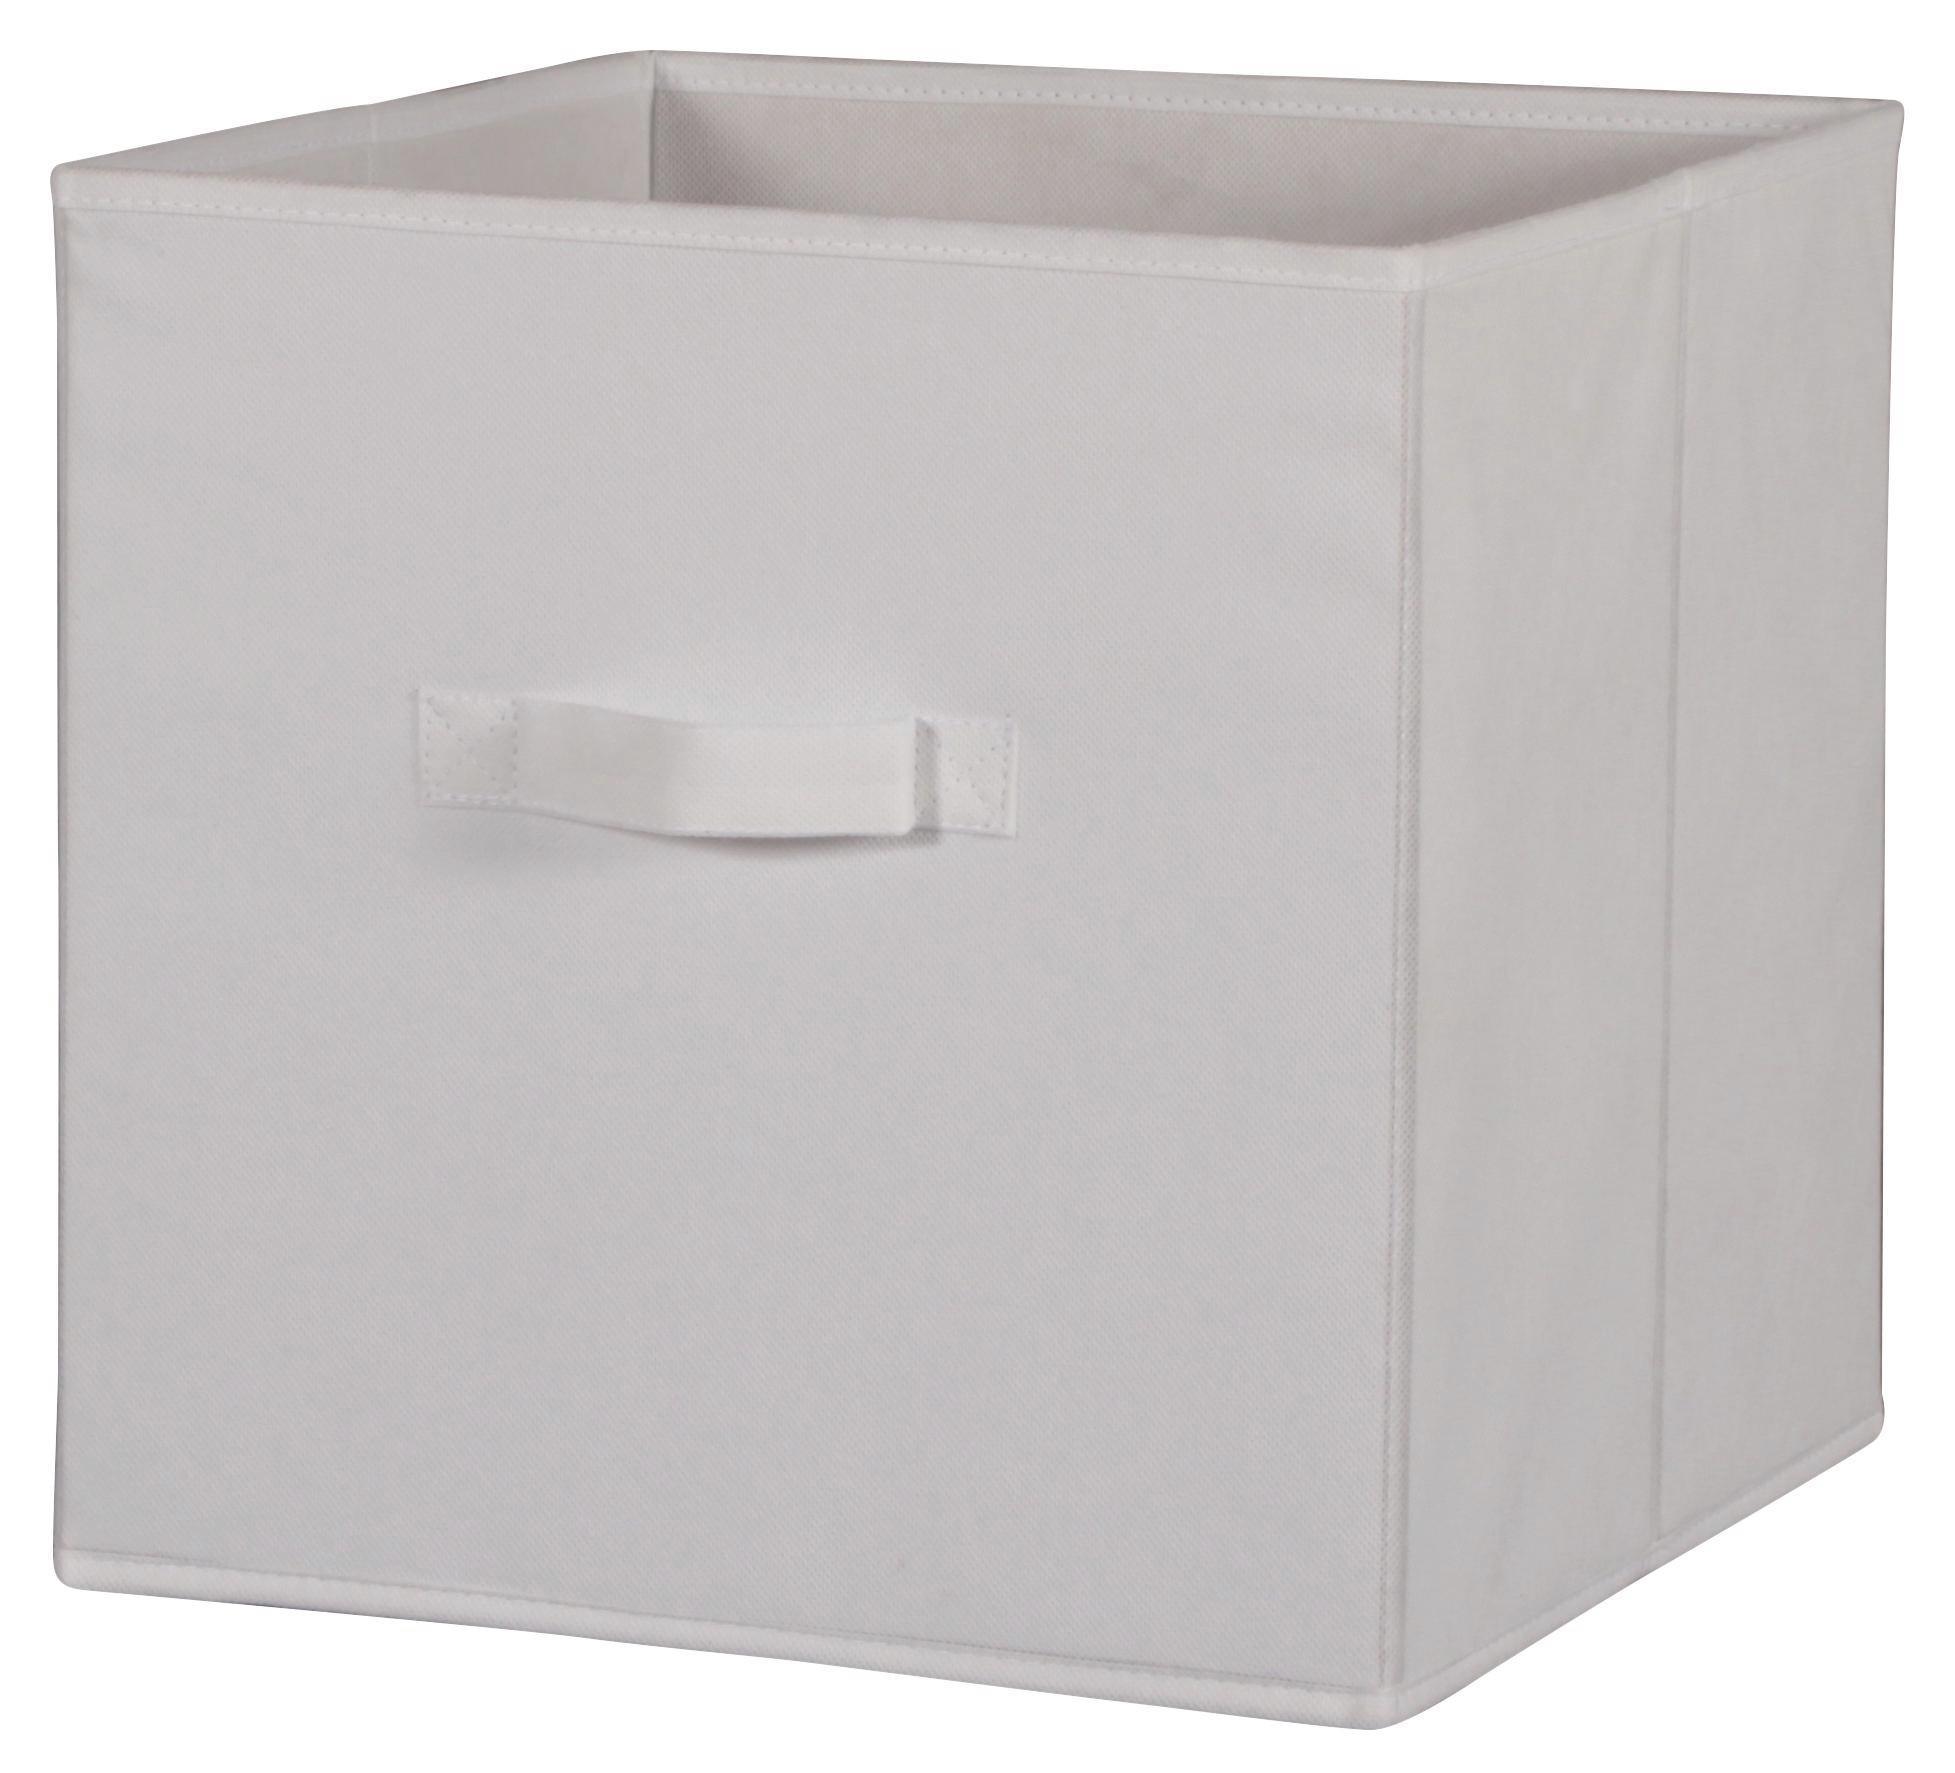 Faltbox Cliff 3 - Weiß, MODERN, Textil (32/32/32cm)